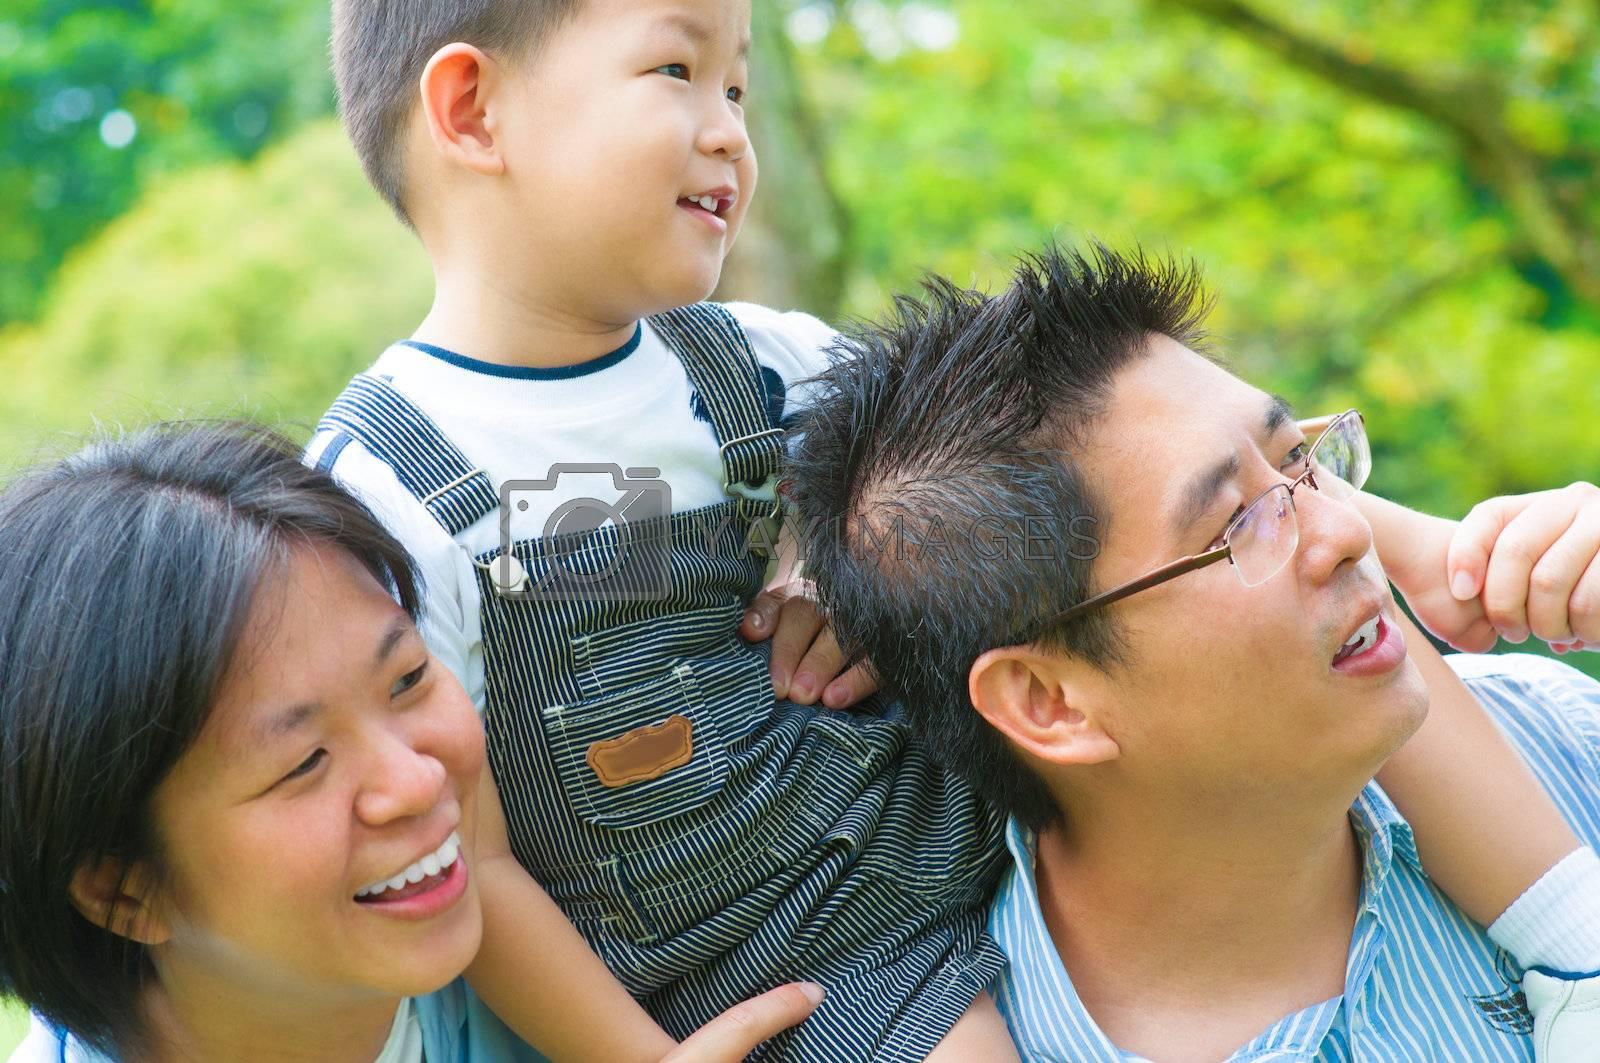 Happy Asian family having fun outdoor green park